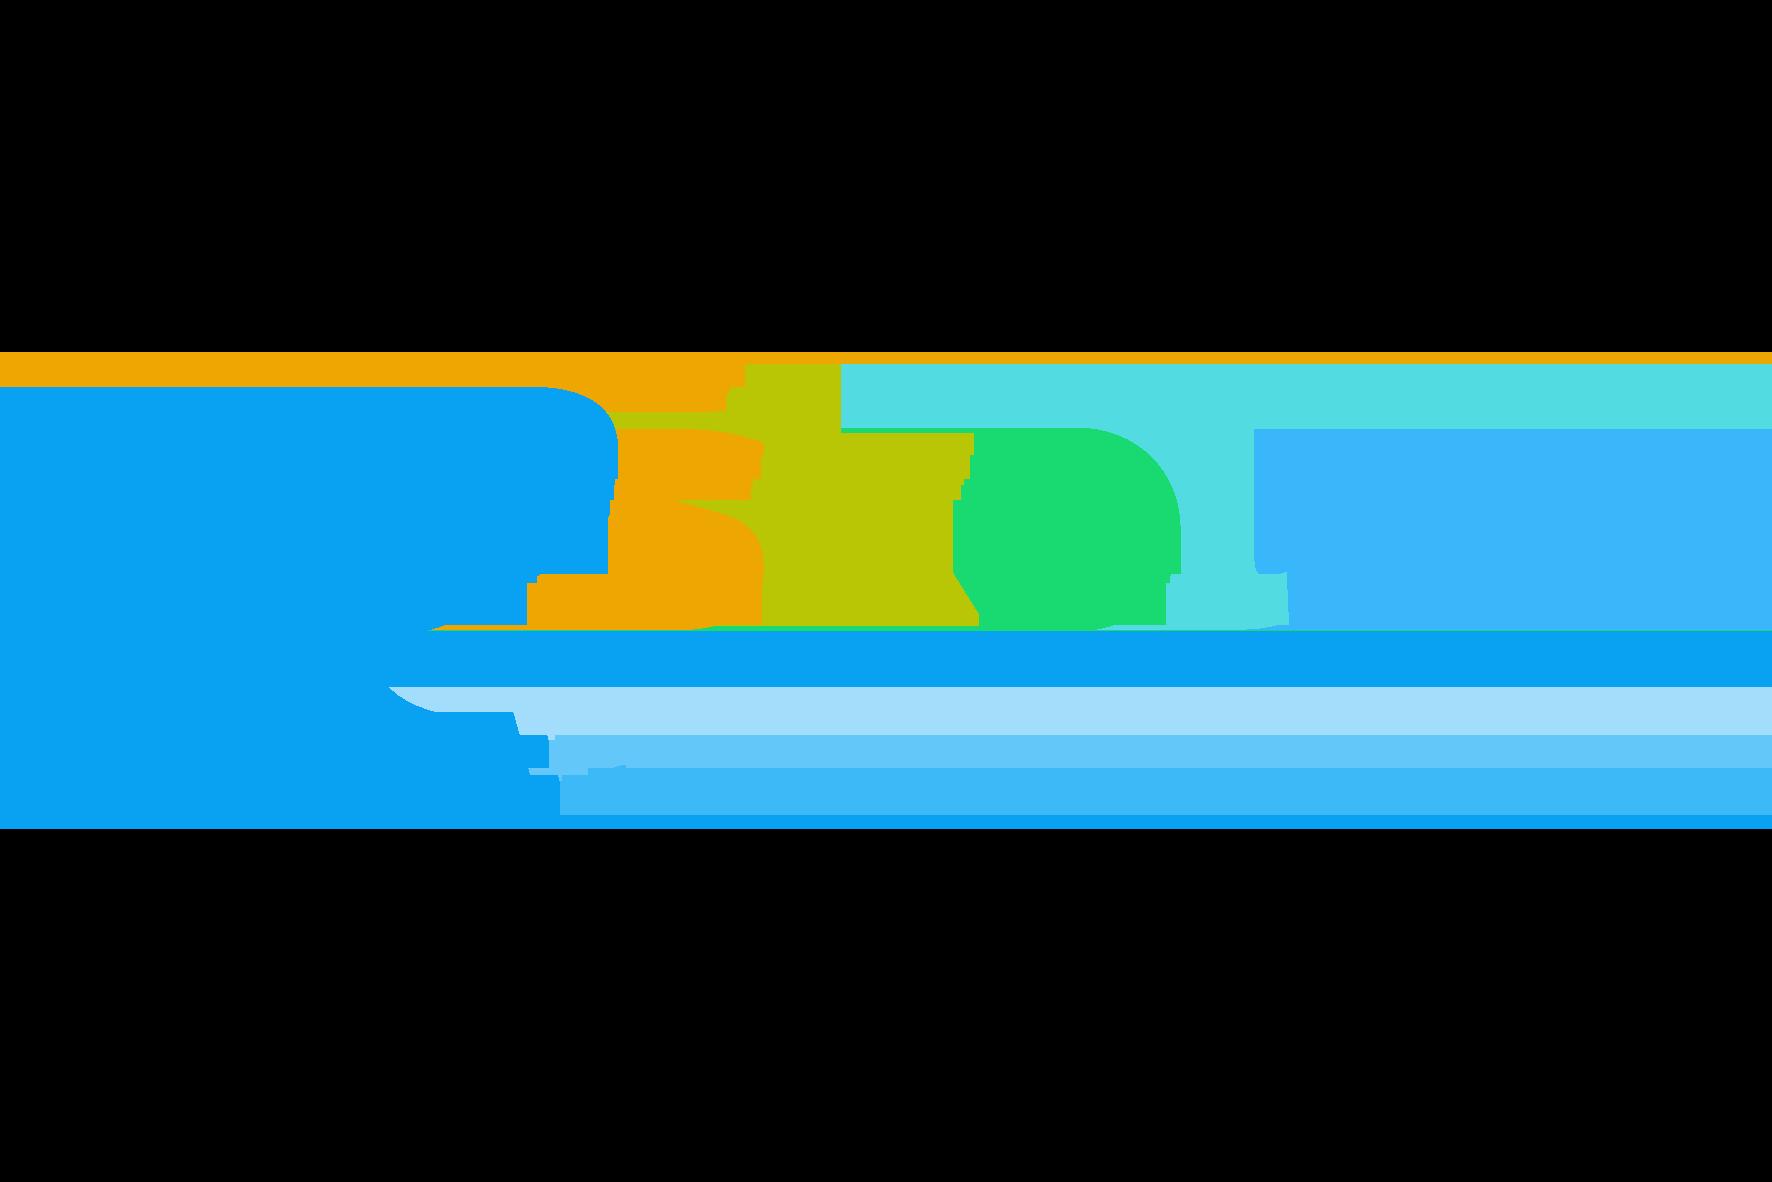 e-škola logo color